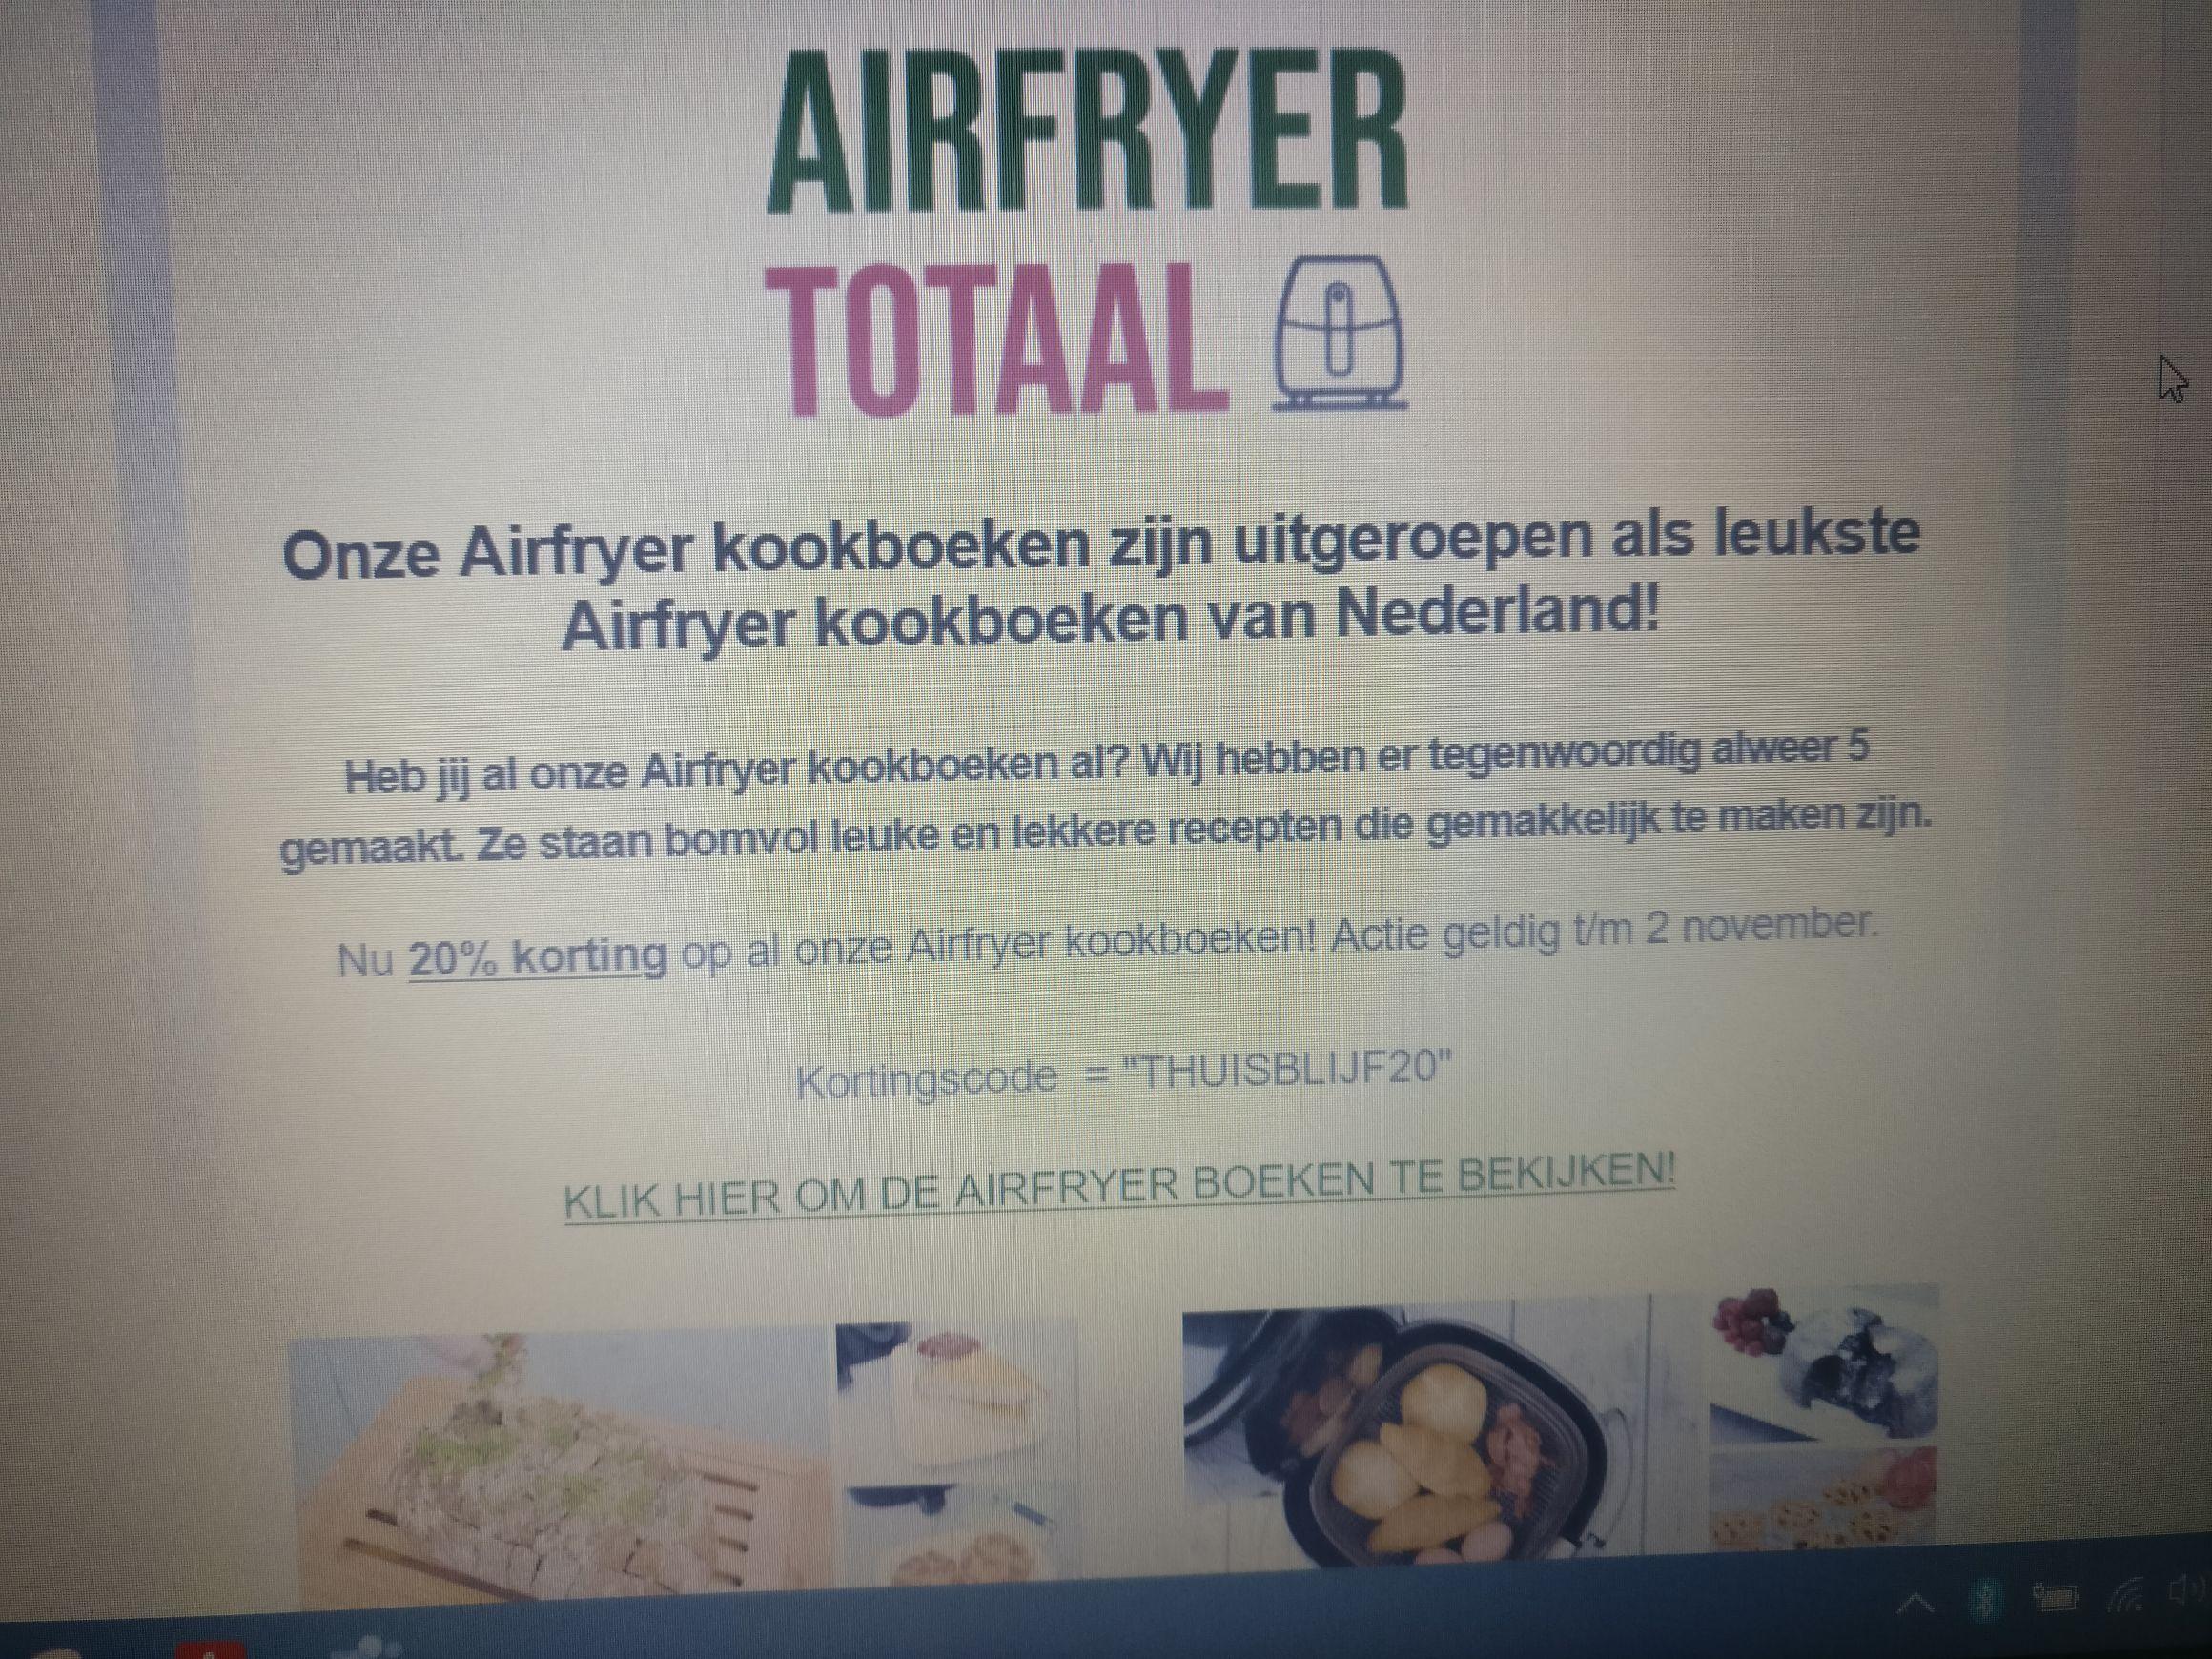 20% korting op airfryer boeken